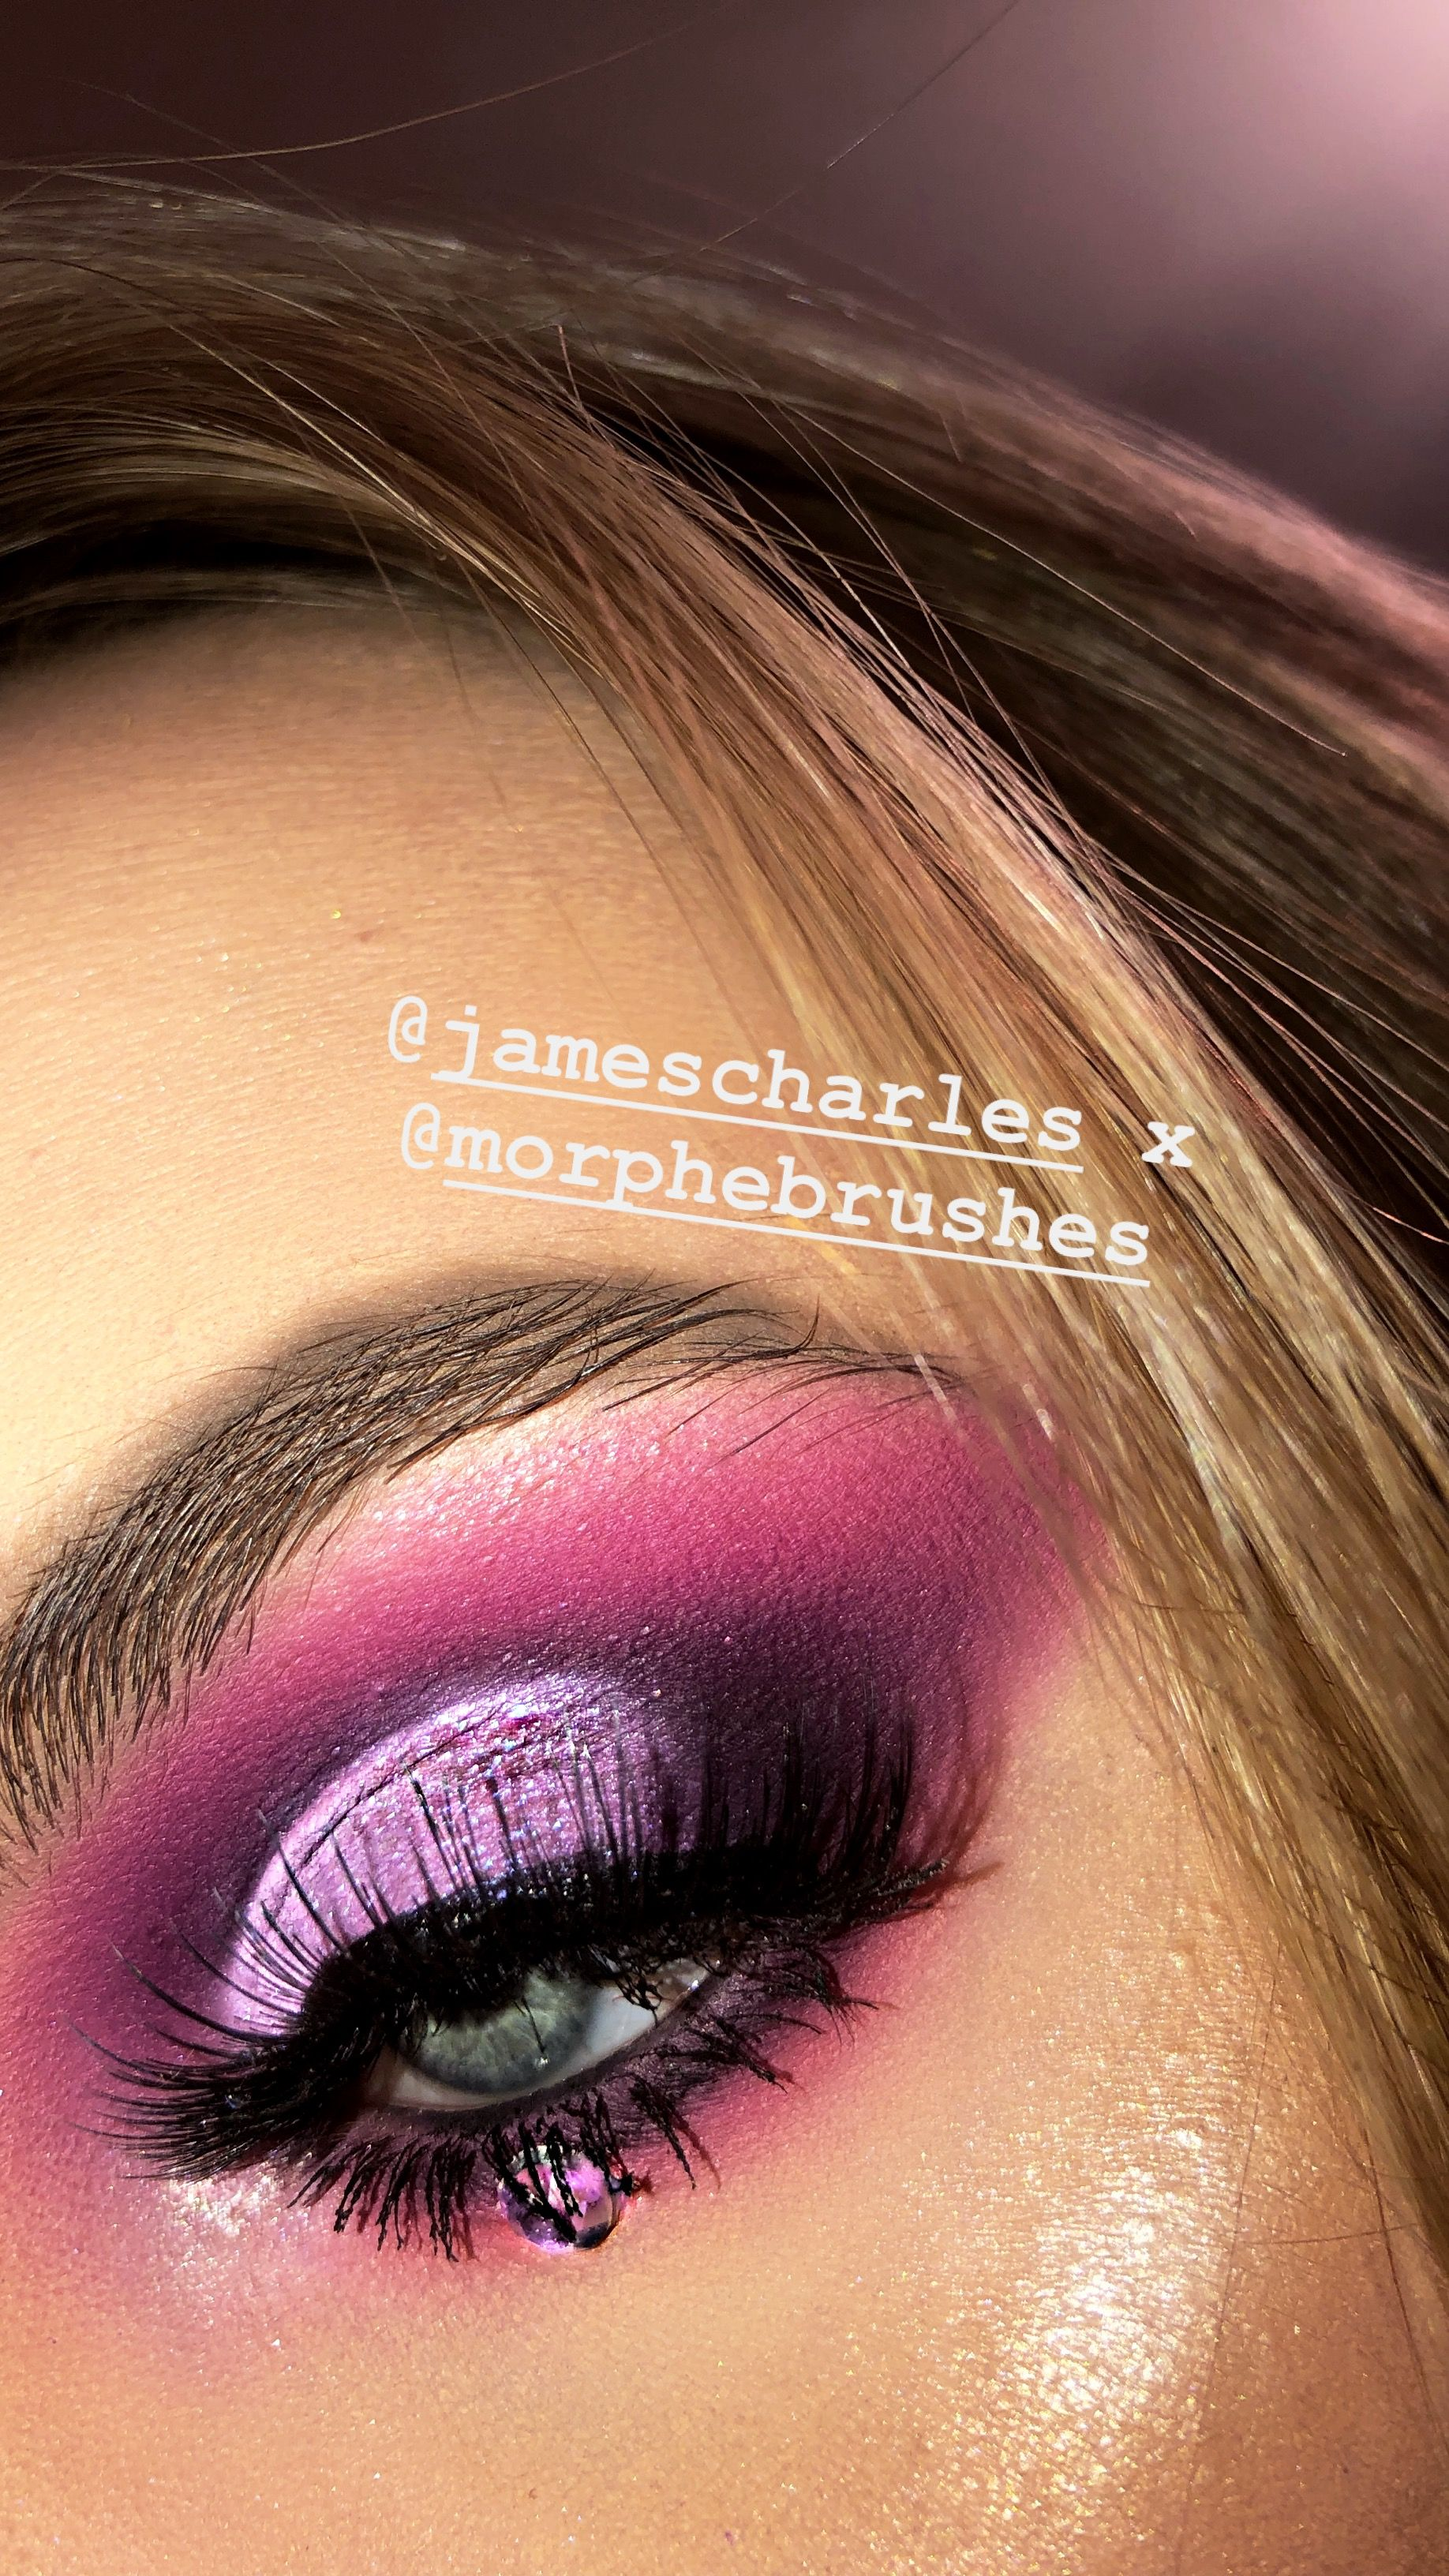 Purple Eyeshadow Using The James Charles X Morphe Palette